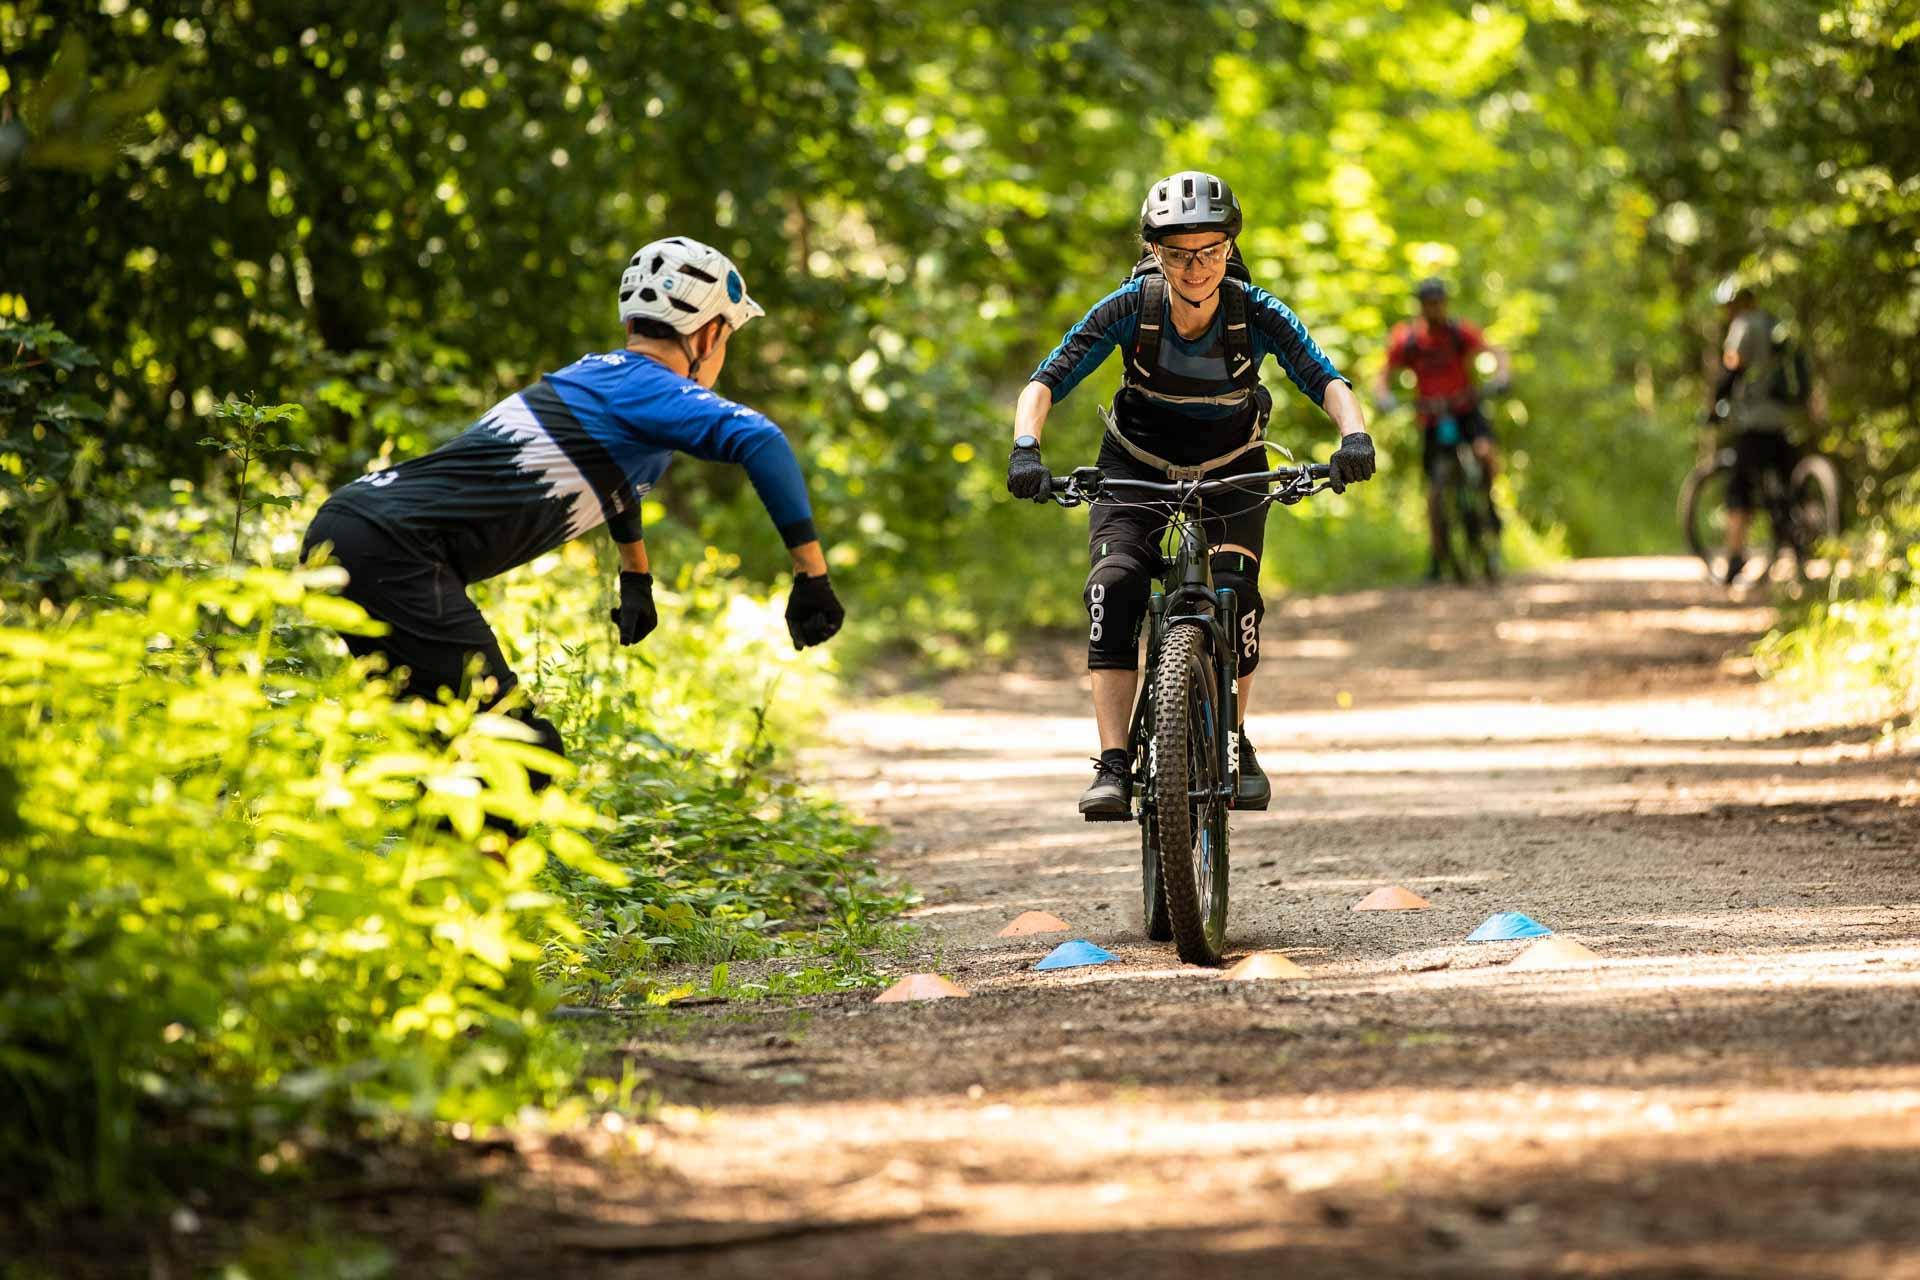 Mountainbike Frauen Kurs in Hannover | Bad Salzdetfurth - Rock my Trail Fahrtechnik Bikeschule